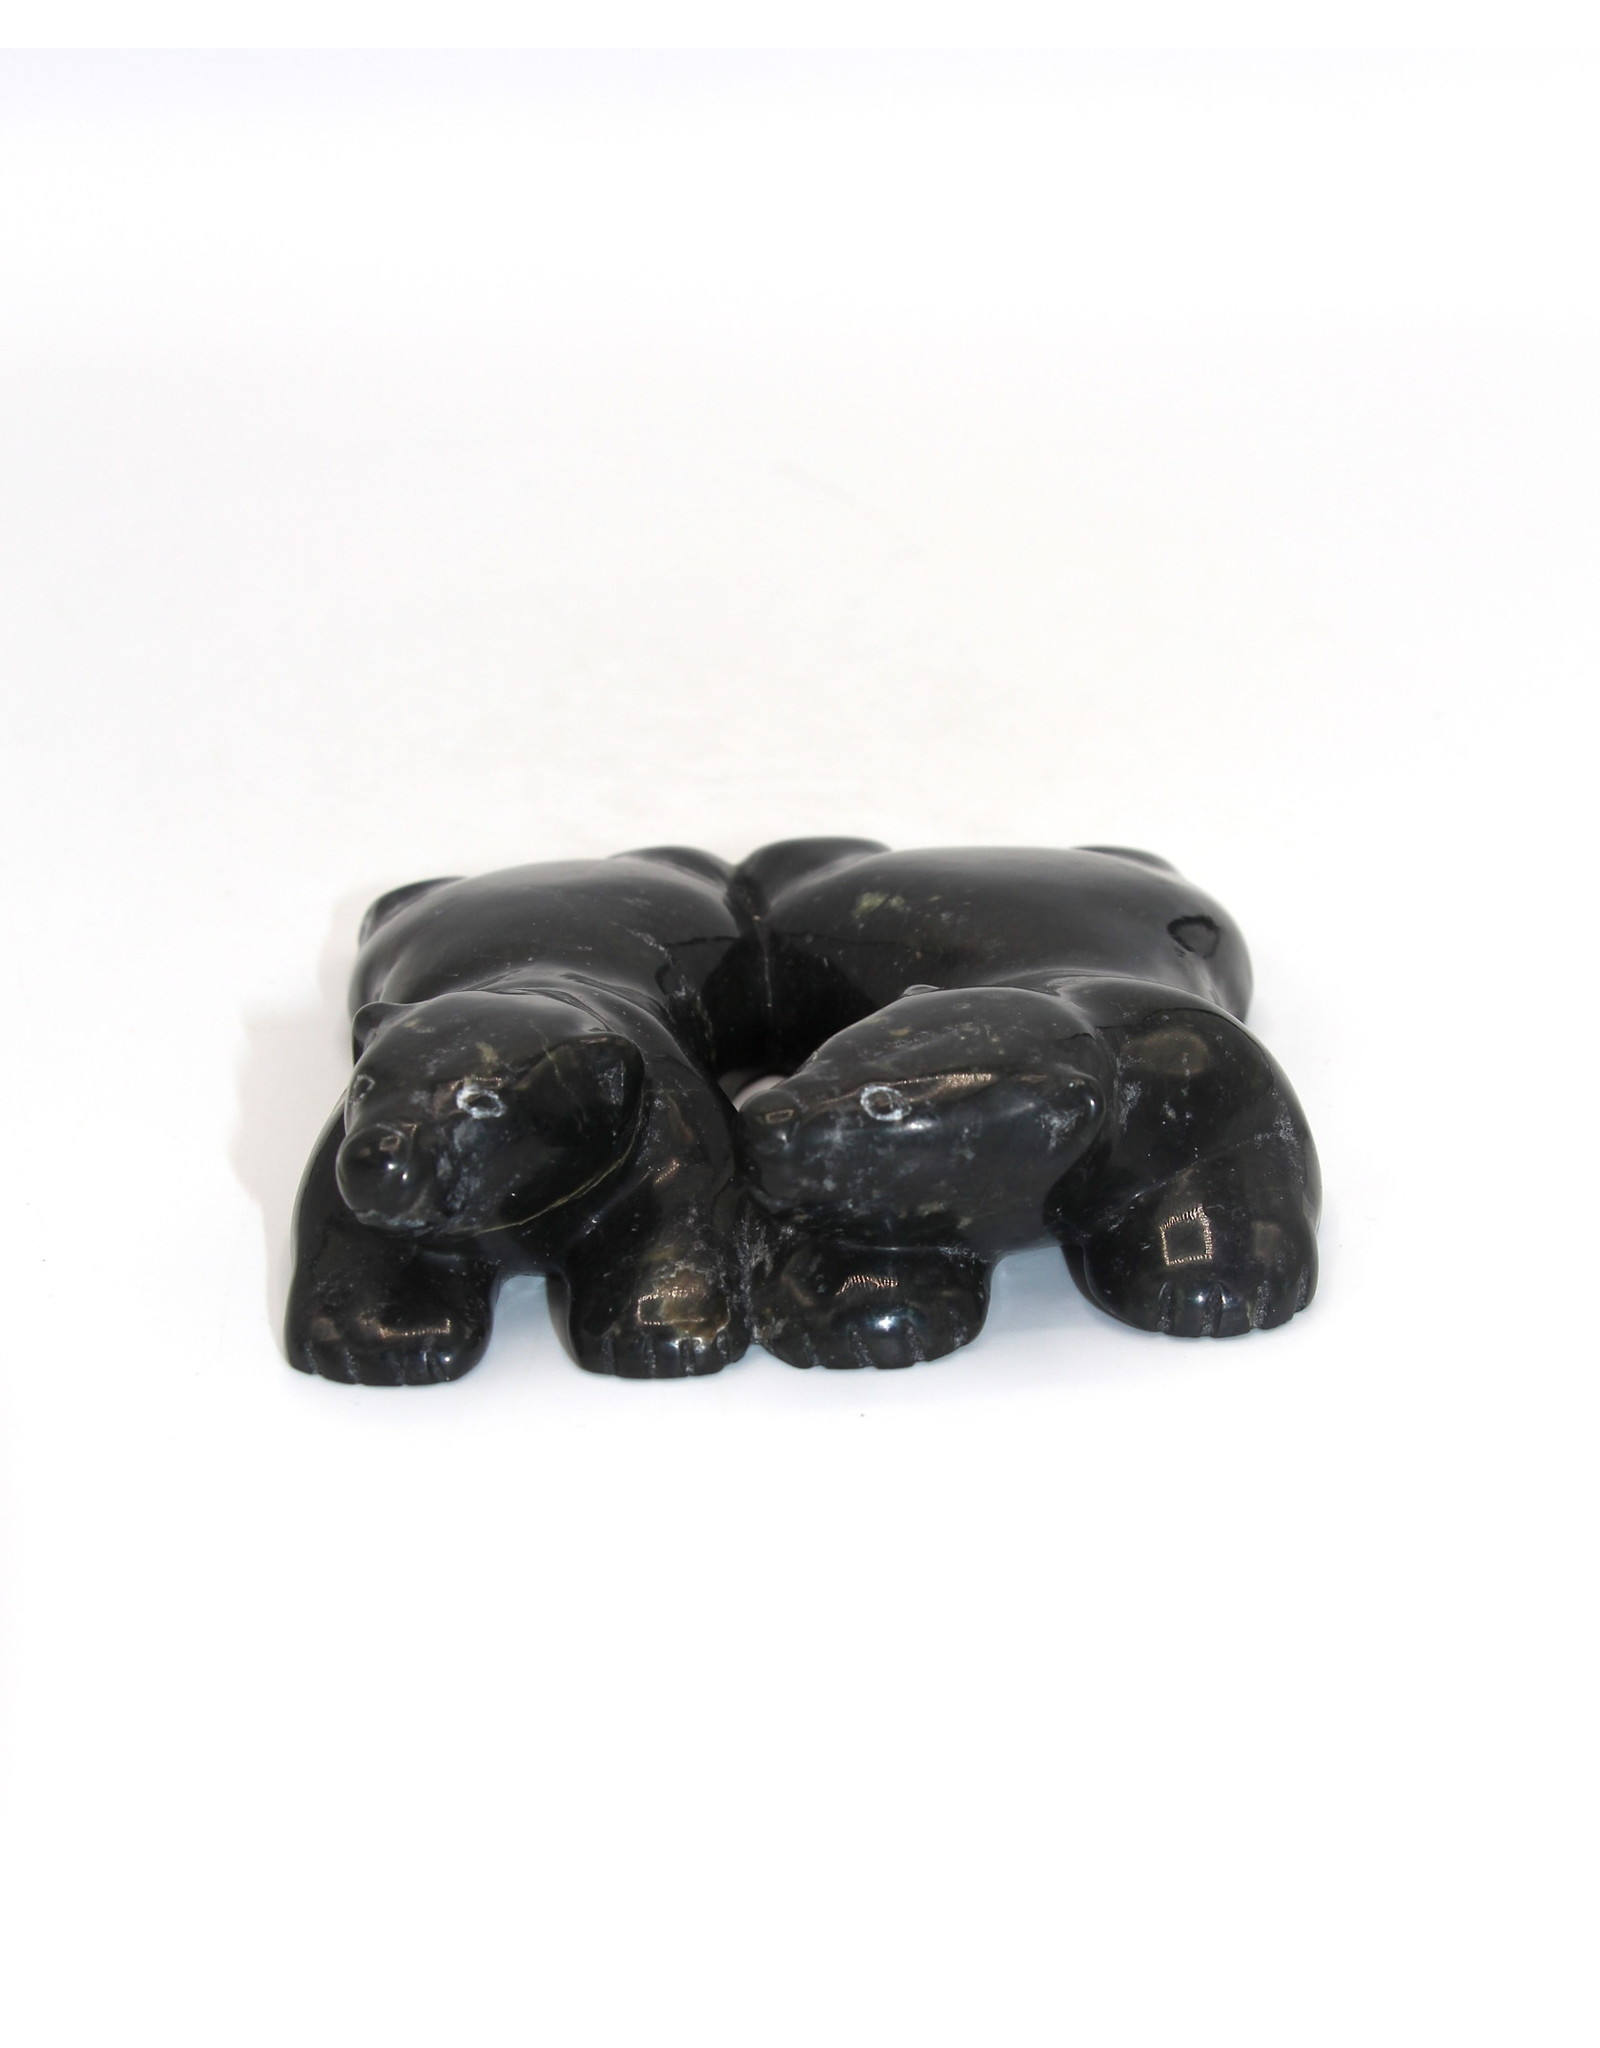 18673 Two Lying Bears by Markoosie Papigatuk